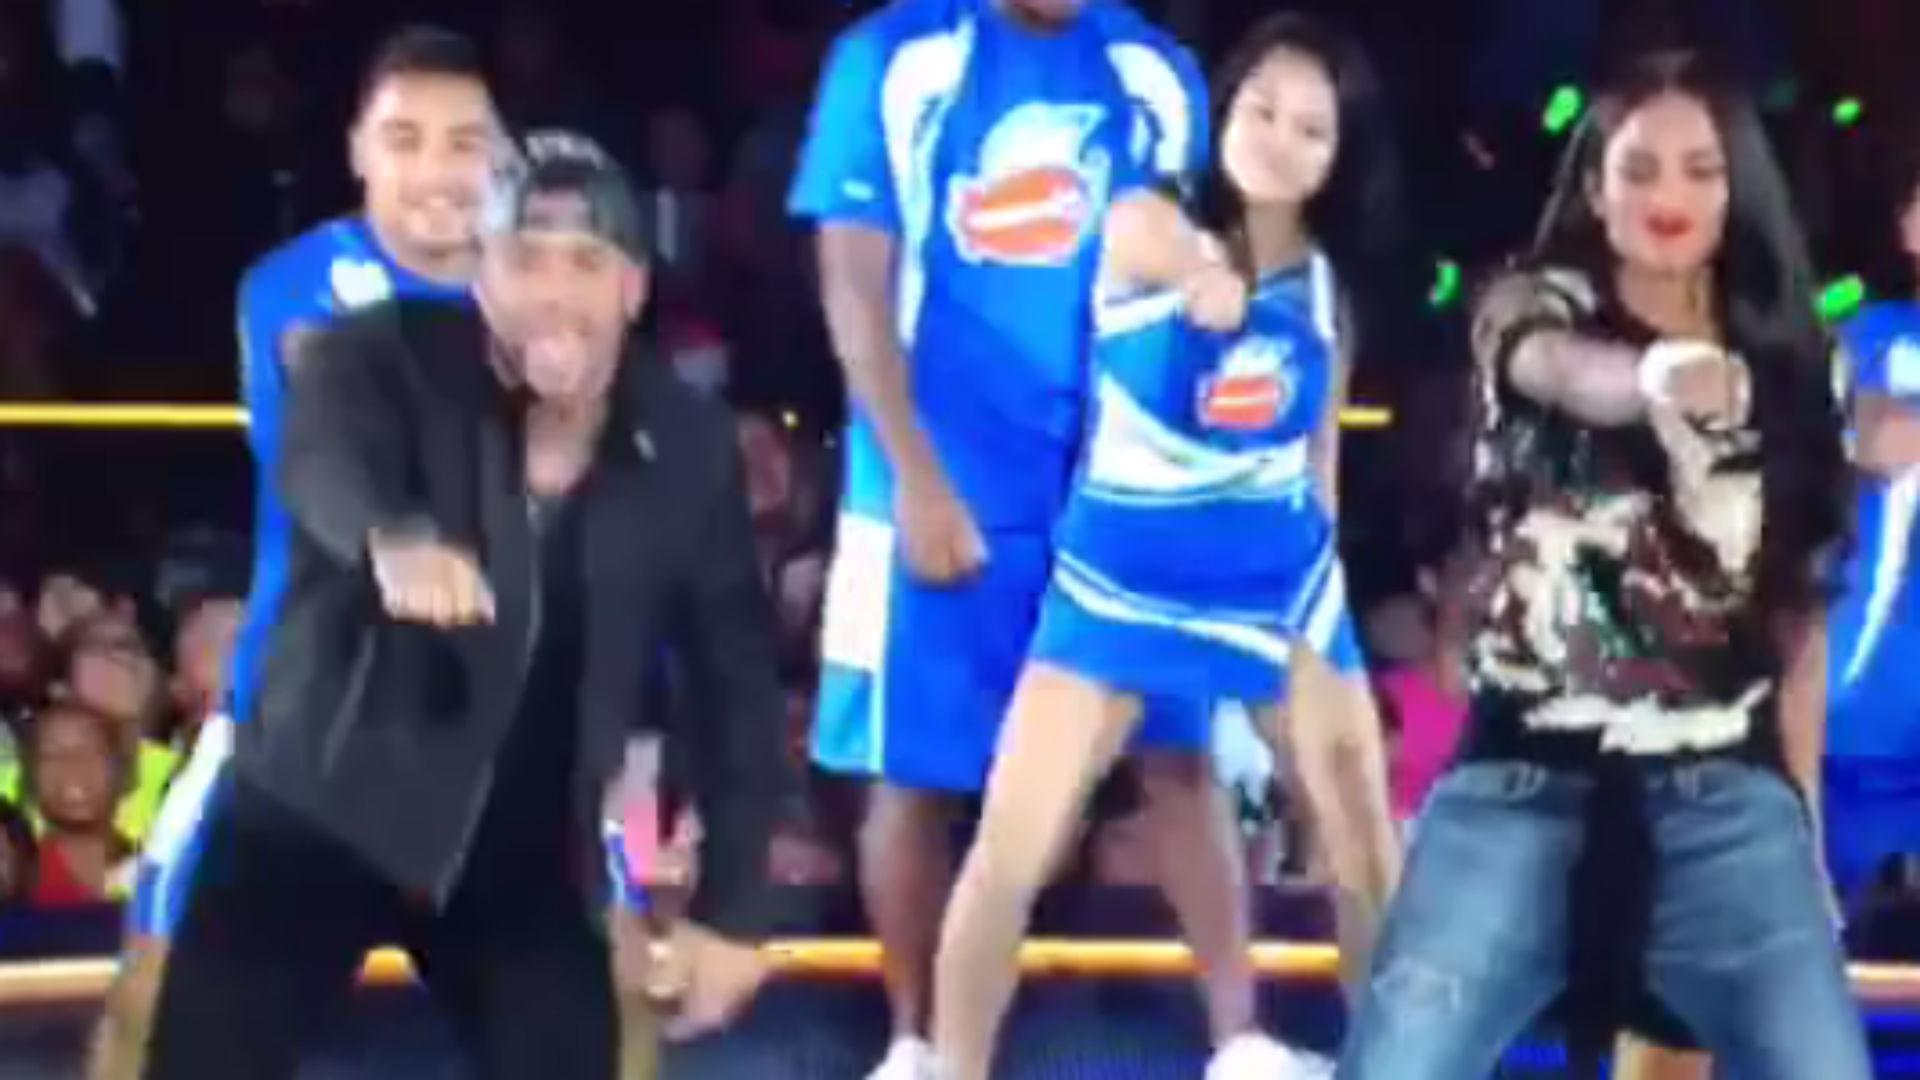 Russell Wilson and Ciara dance-07172015-FTR-Vine .jpg